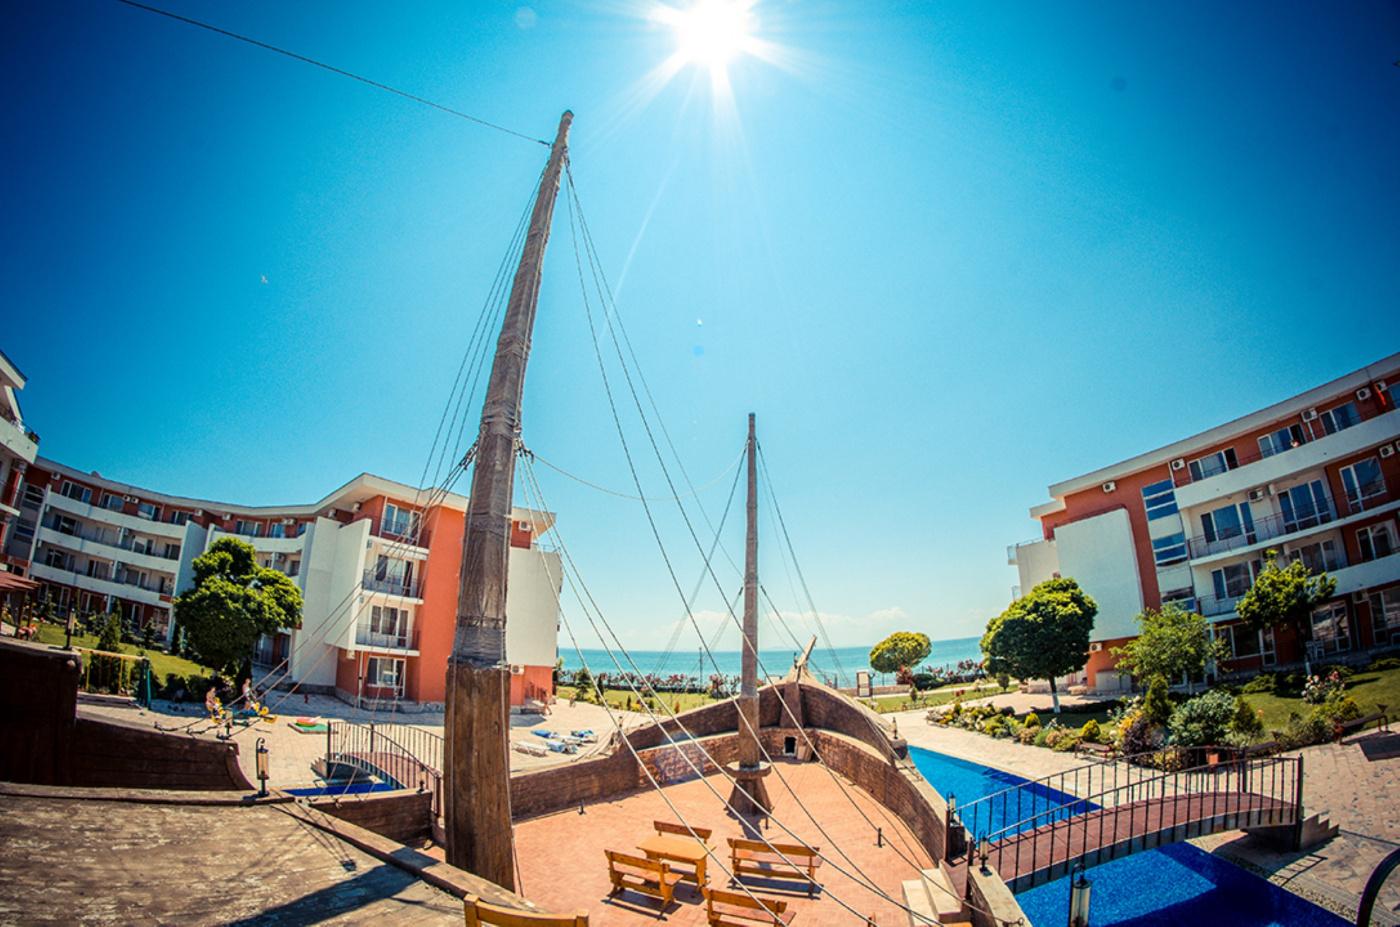 Privilege Fort Beach Апарт-отель